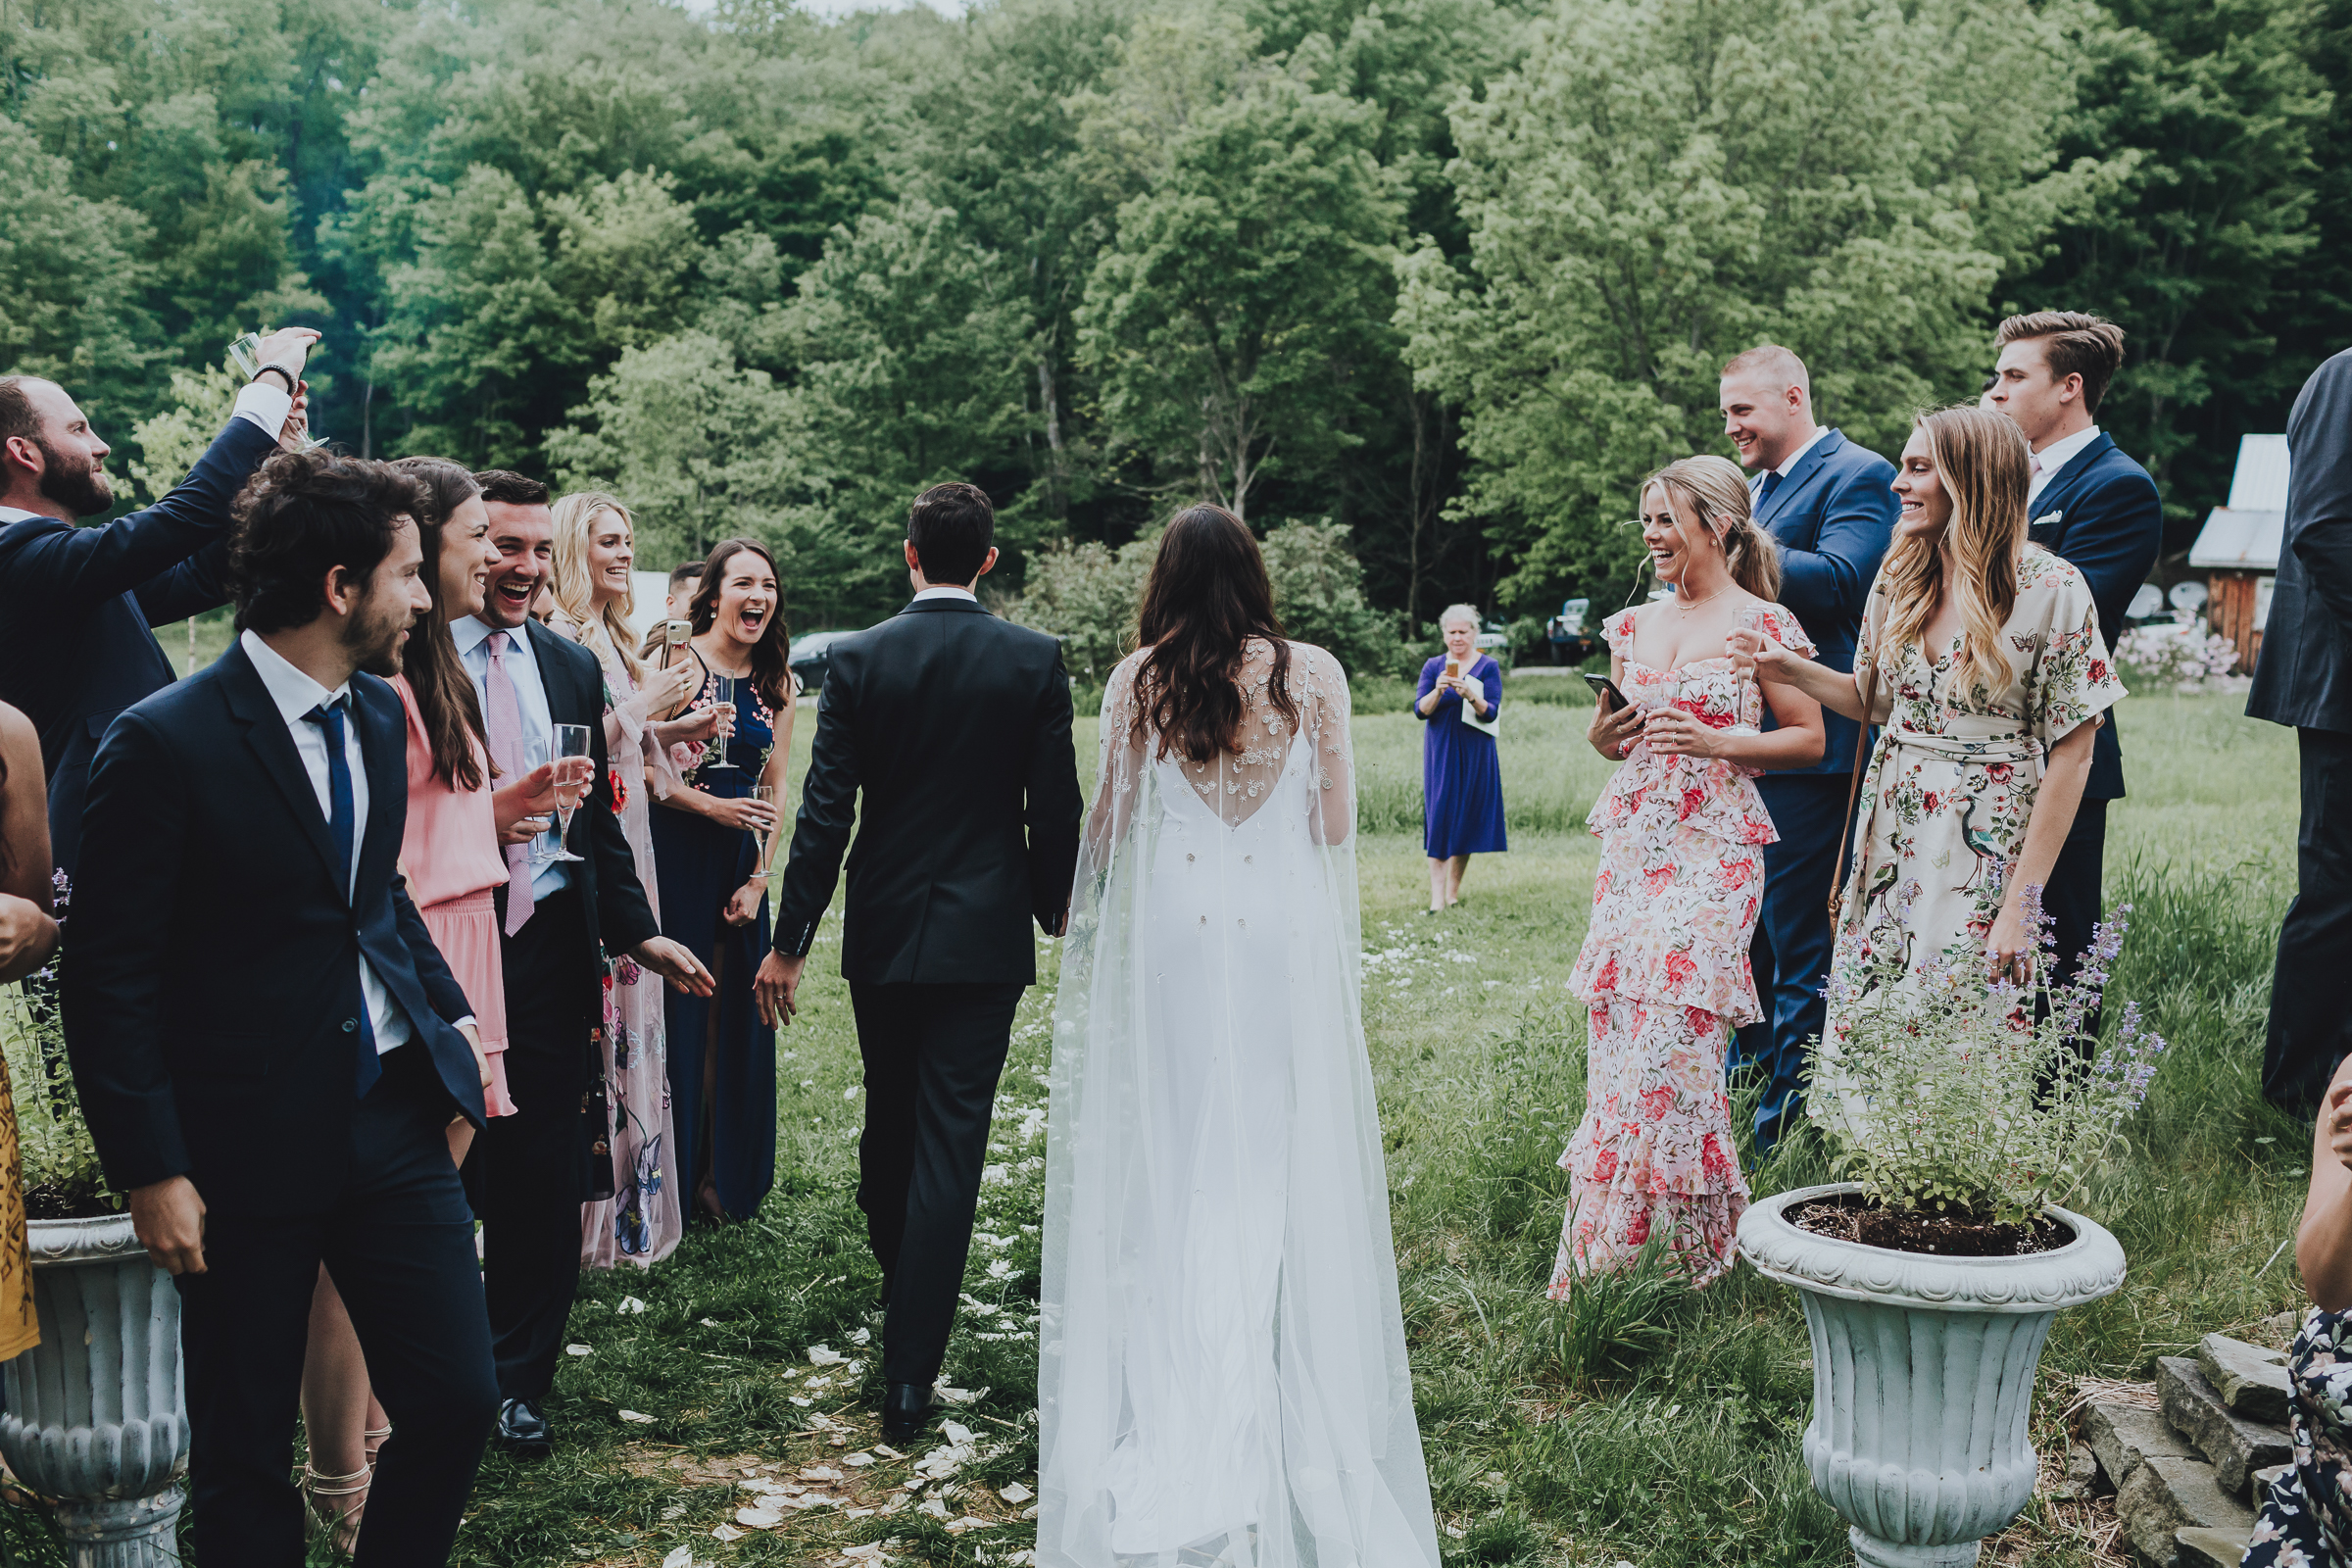 Handsome-Hollow-Long-Eddy-Catskills-New-York-Fine-Art-Documentary-Wedding-Photographer-74.jpg